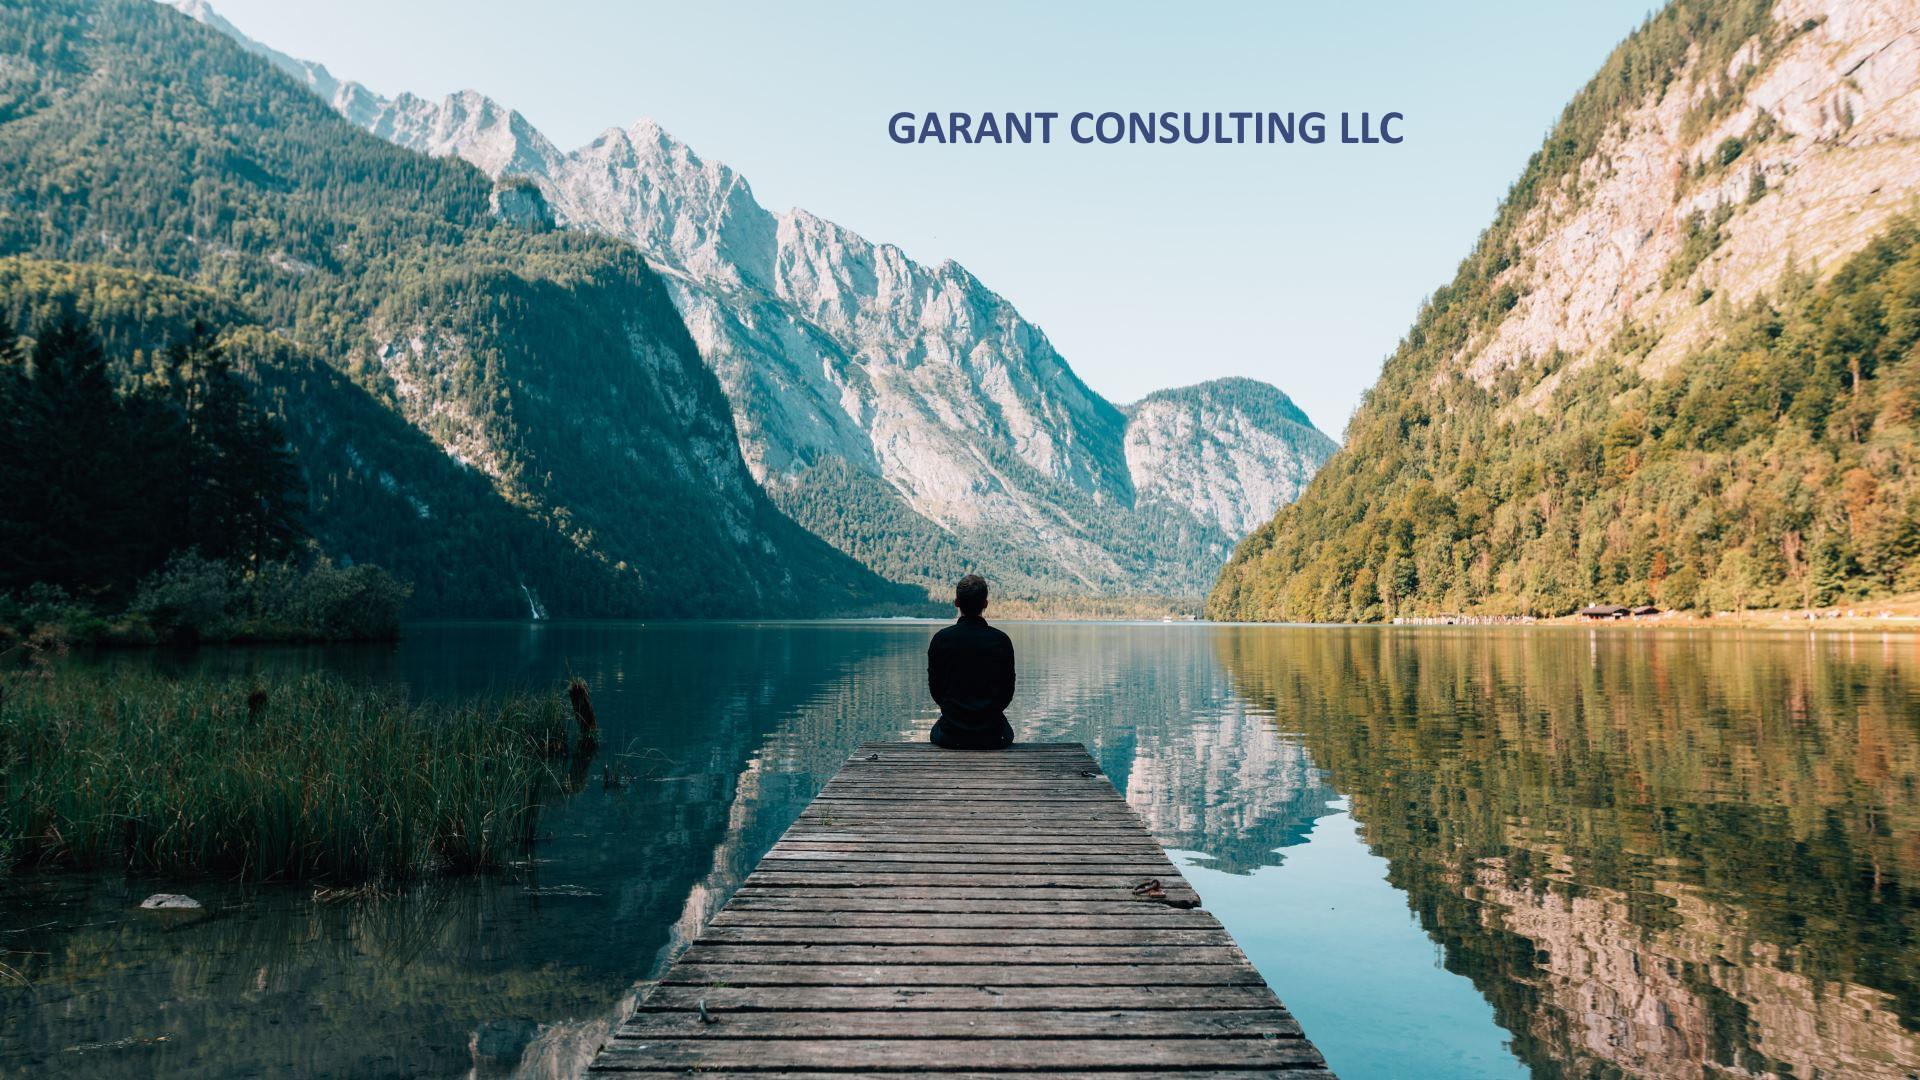 Garant Consulting LLC